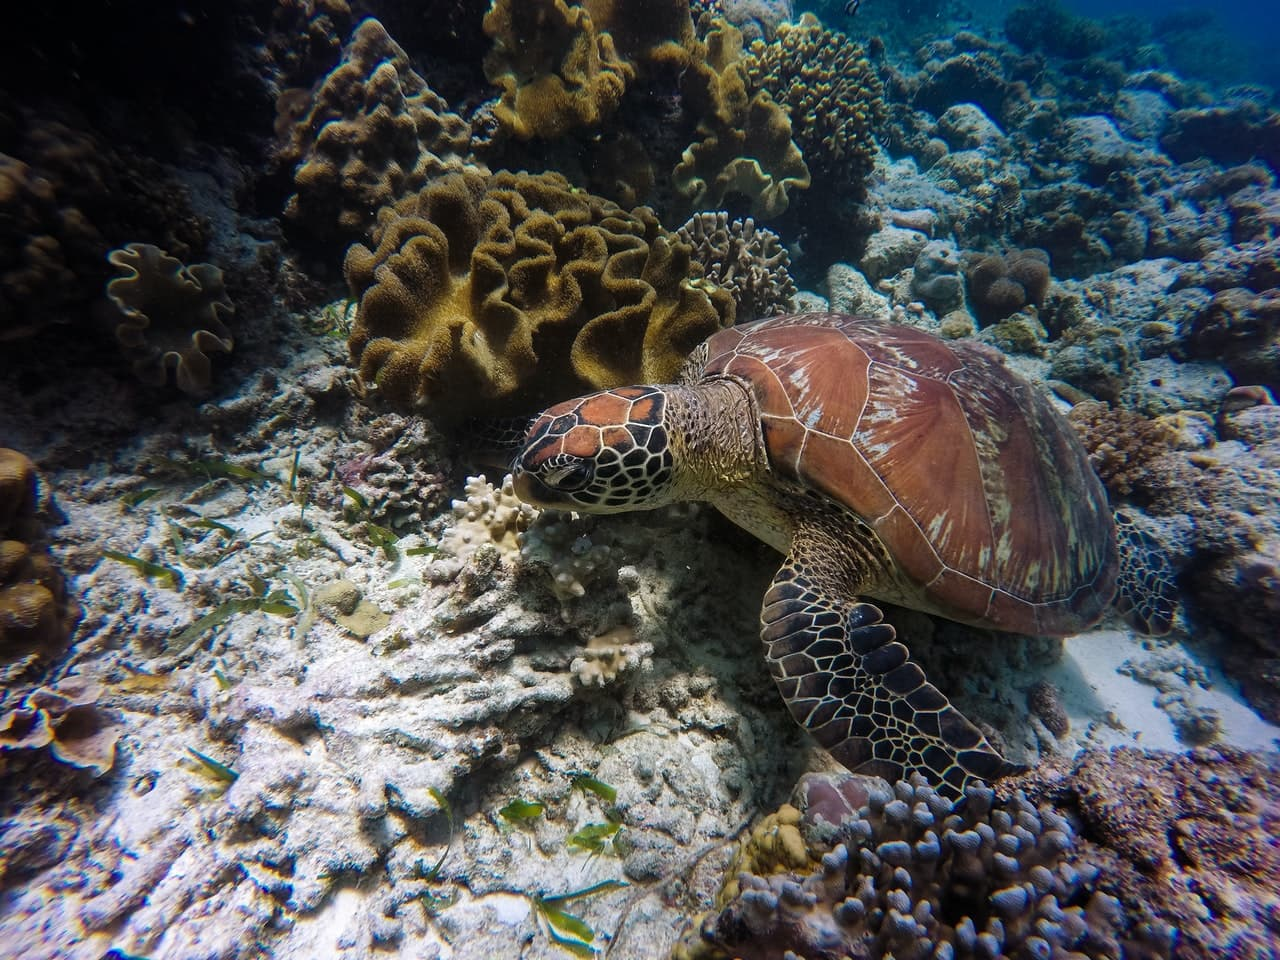 aprende ingles partes animales tortuga marina arrecife